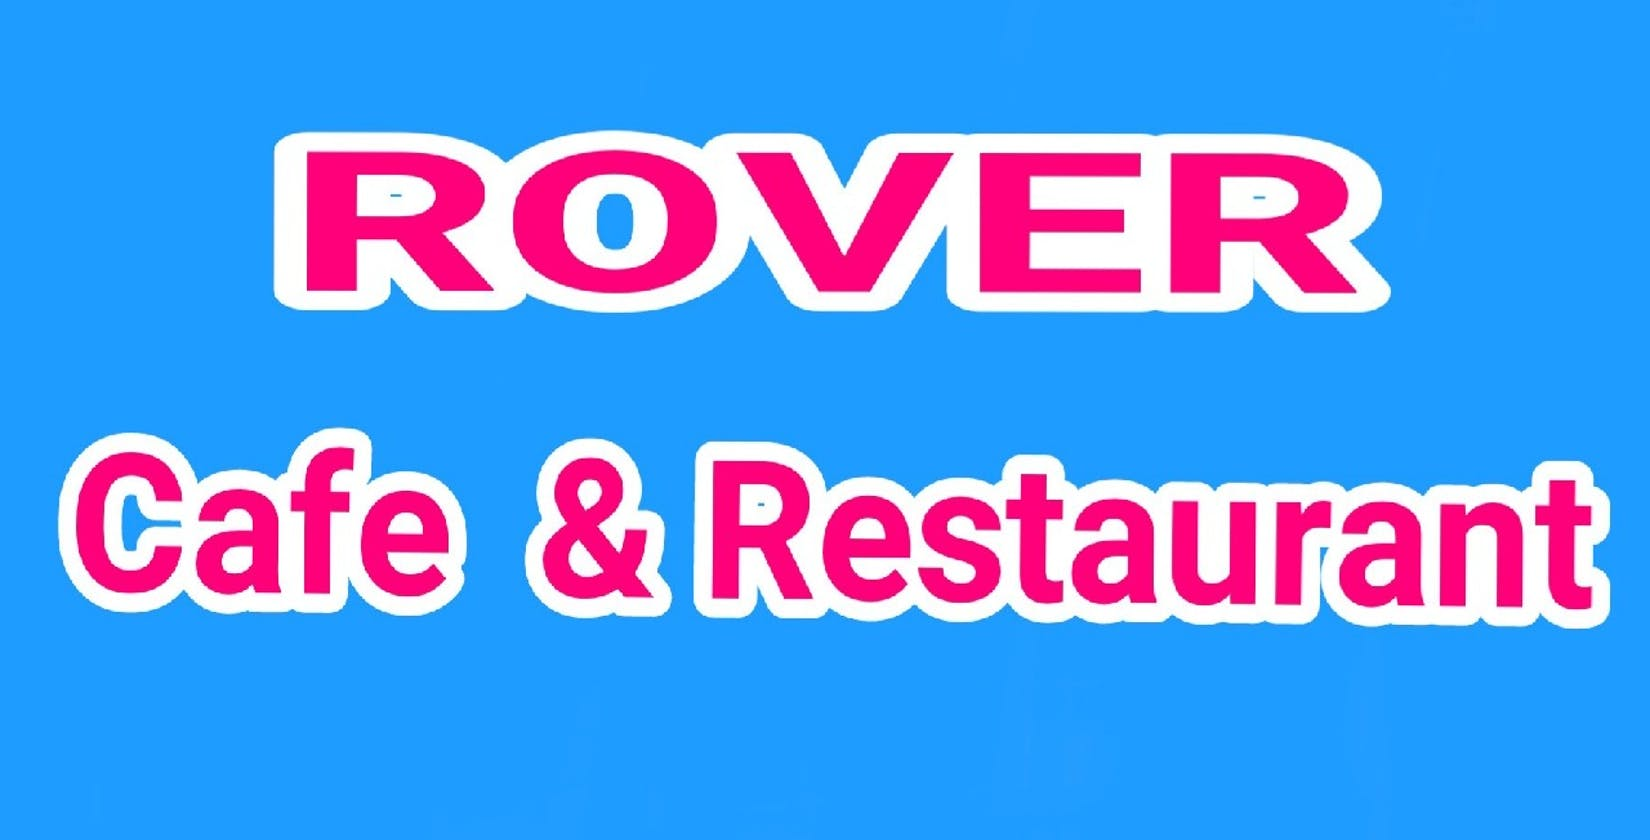 ROVER Cafe & BBQ Restaurant | yathar